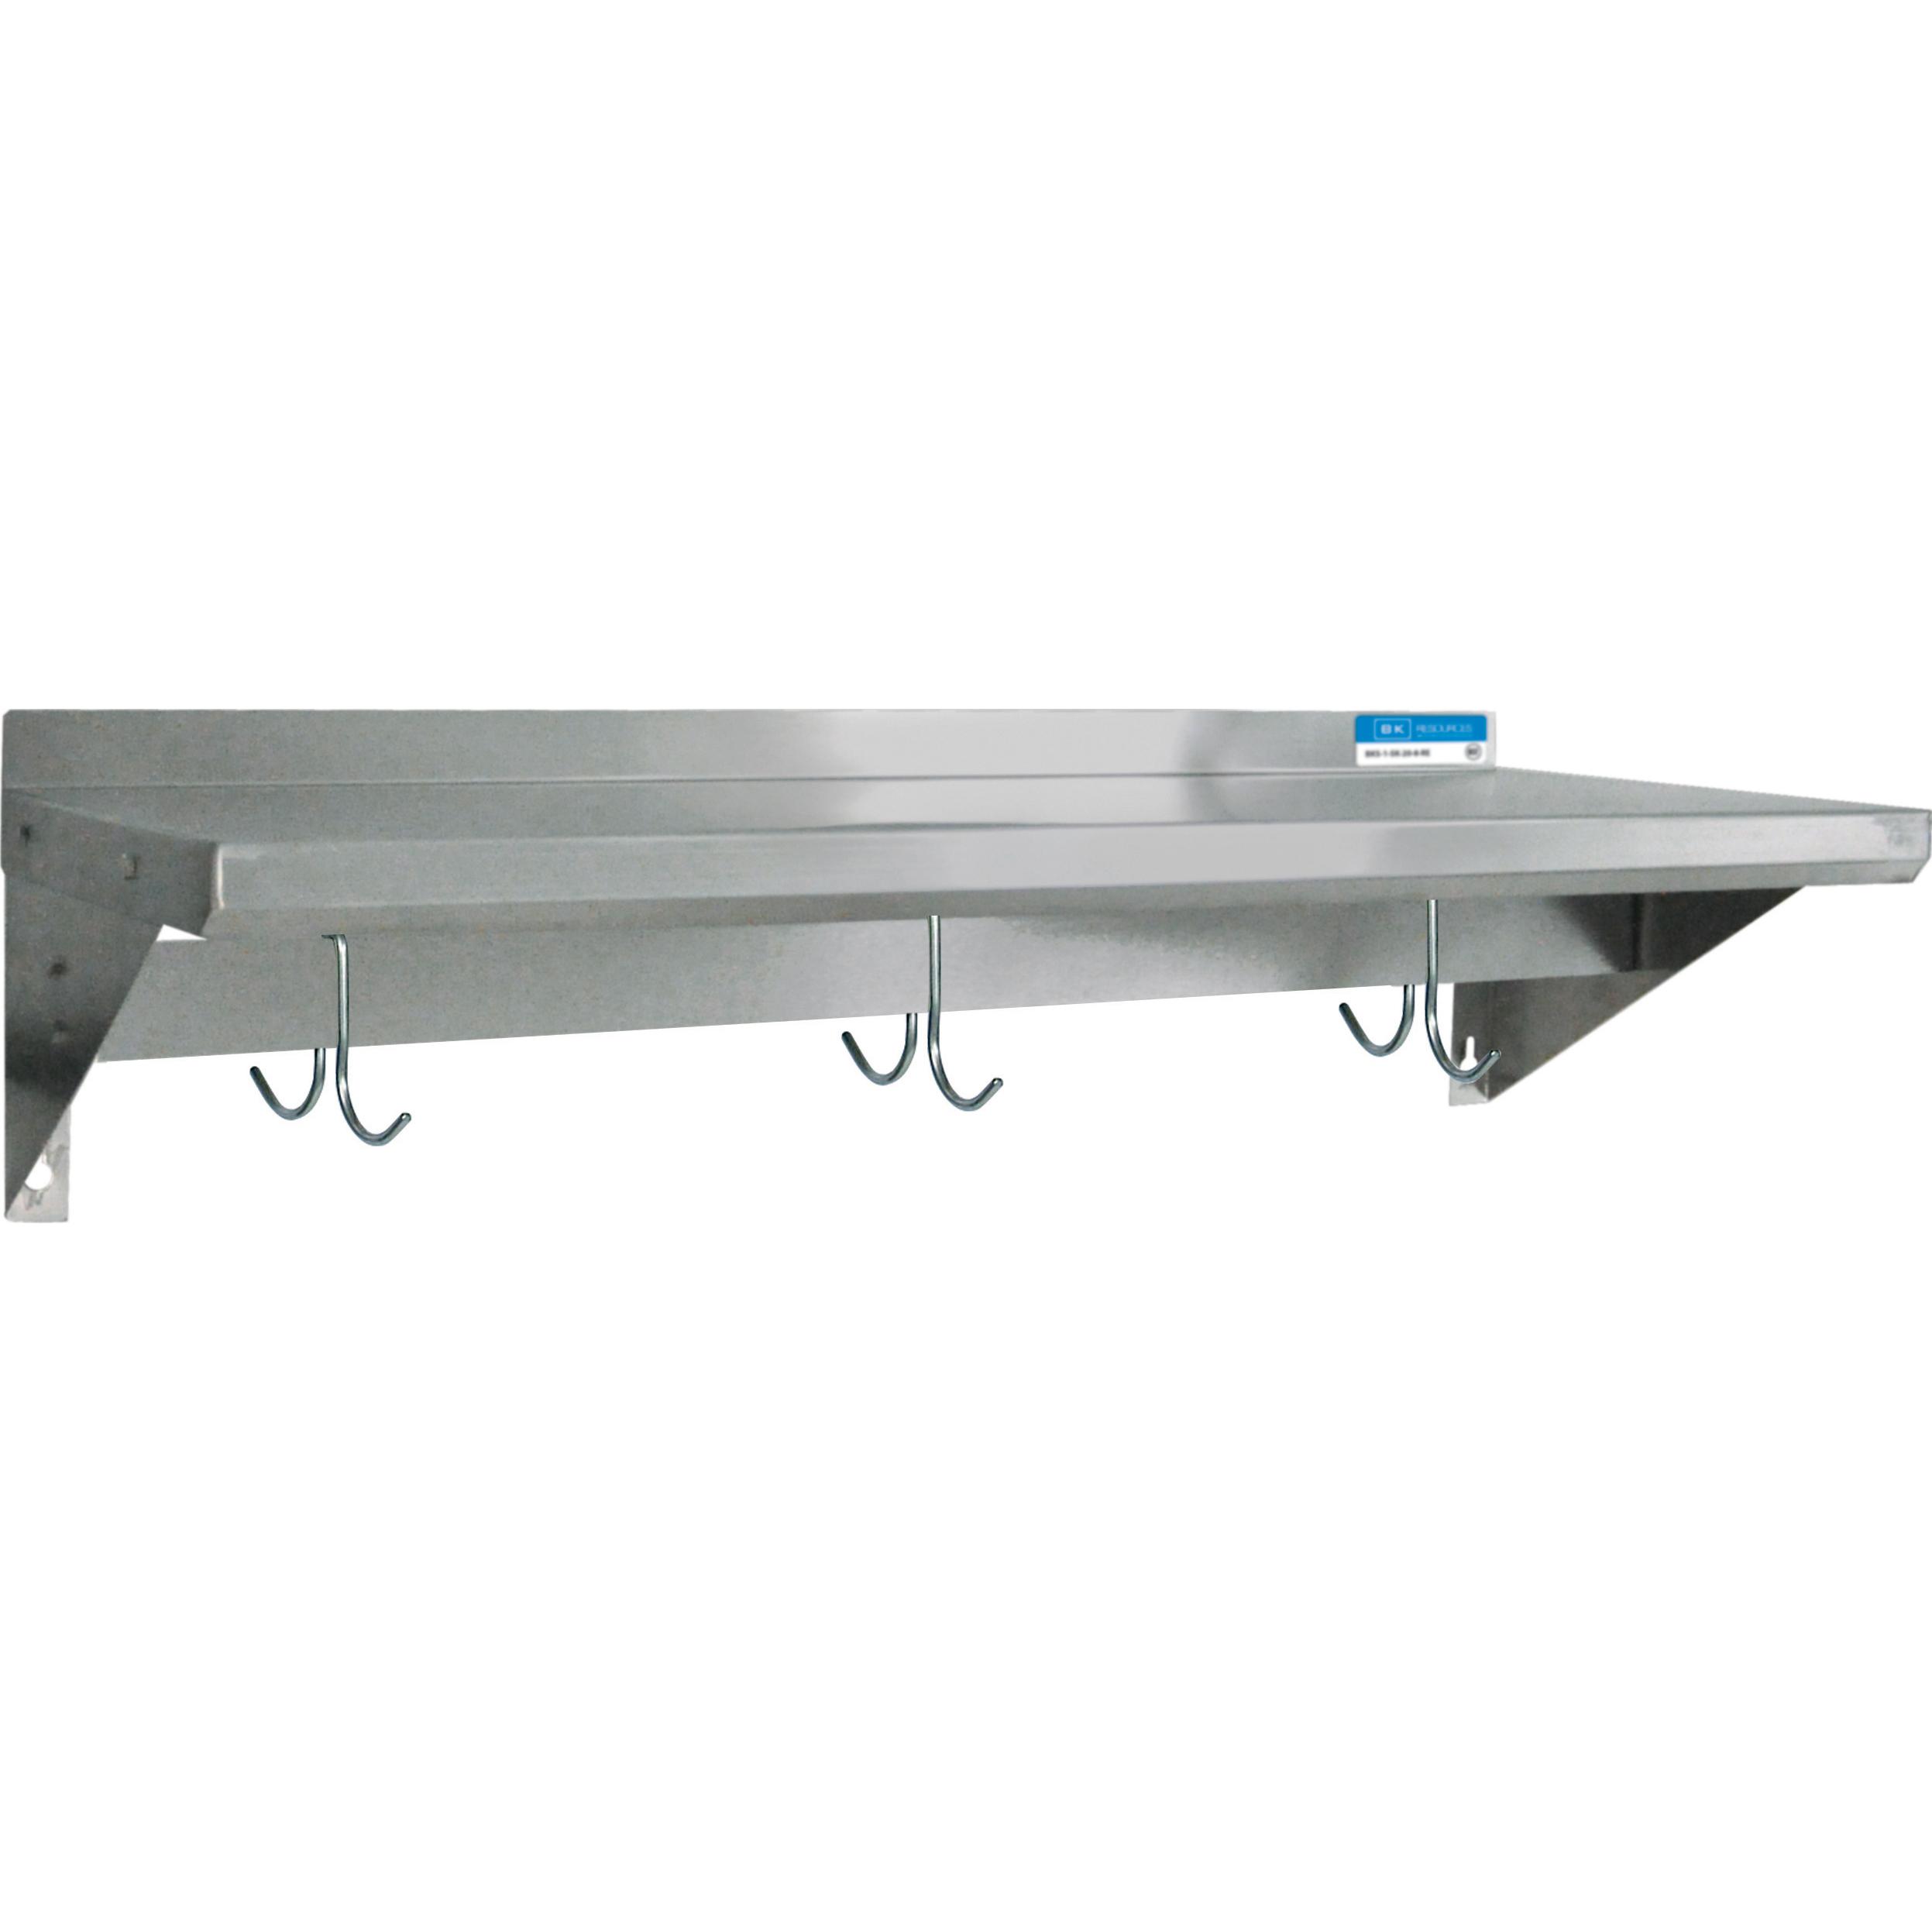 BK Resources BKWSE-1696-PR overshelf, wall-mounted with pot rack